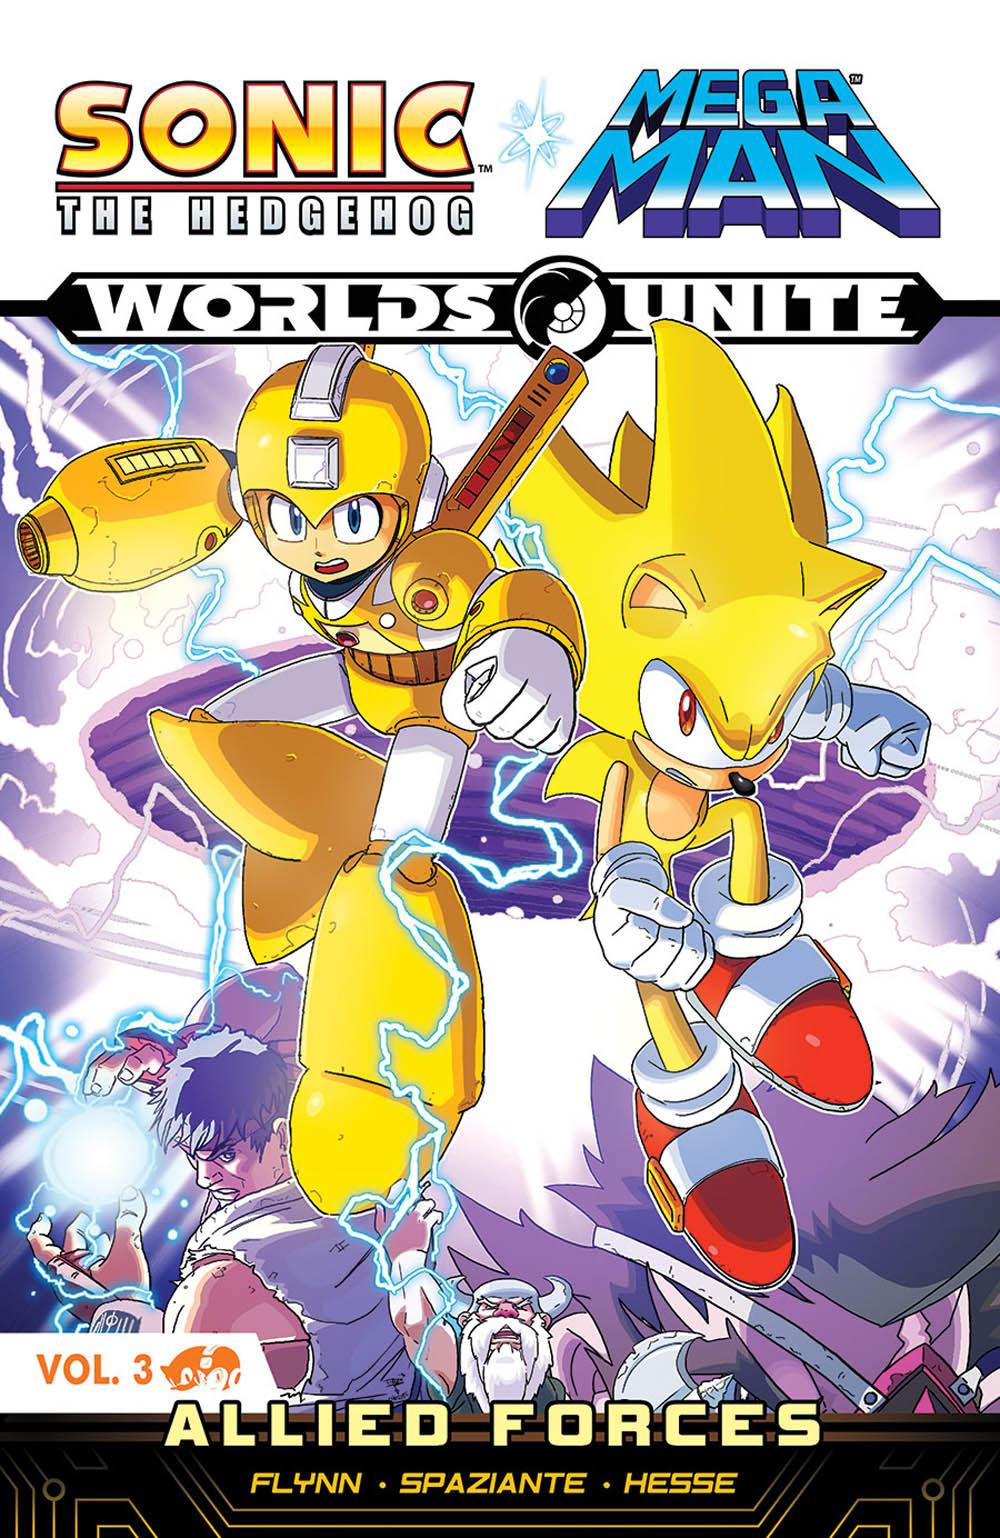 Sonic The Hedgehog Mega Man Worlds Unite Volume 3 Allied